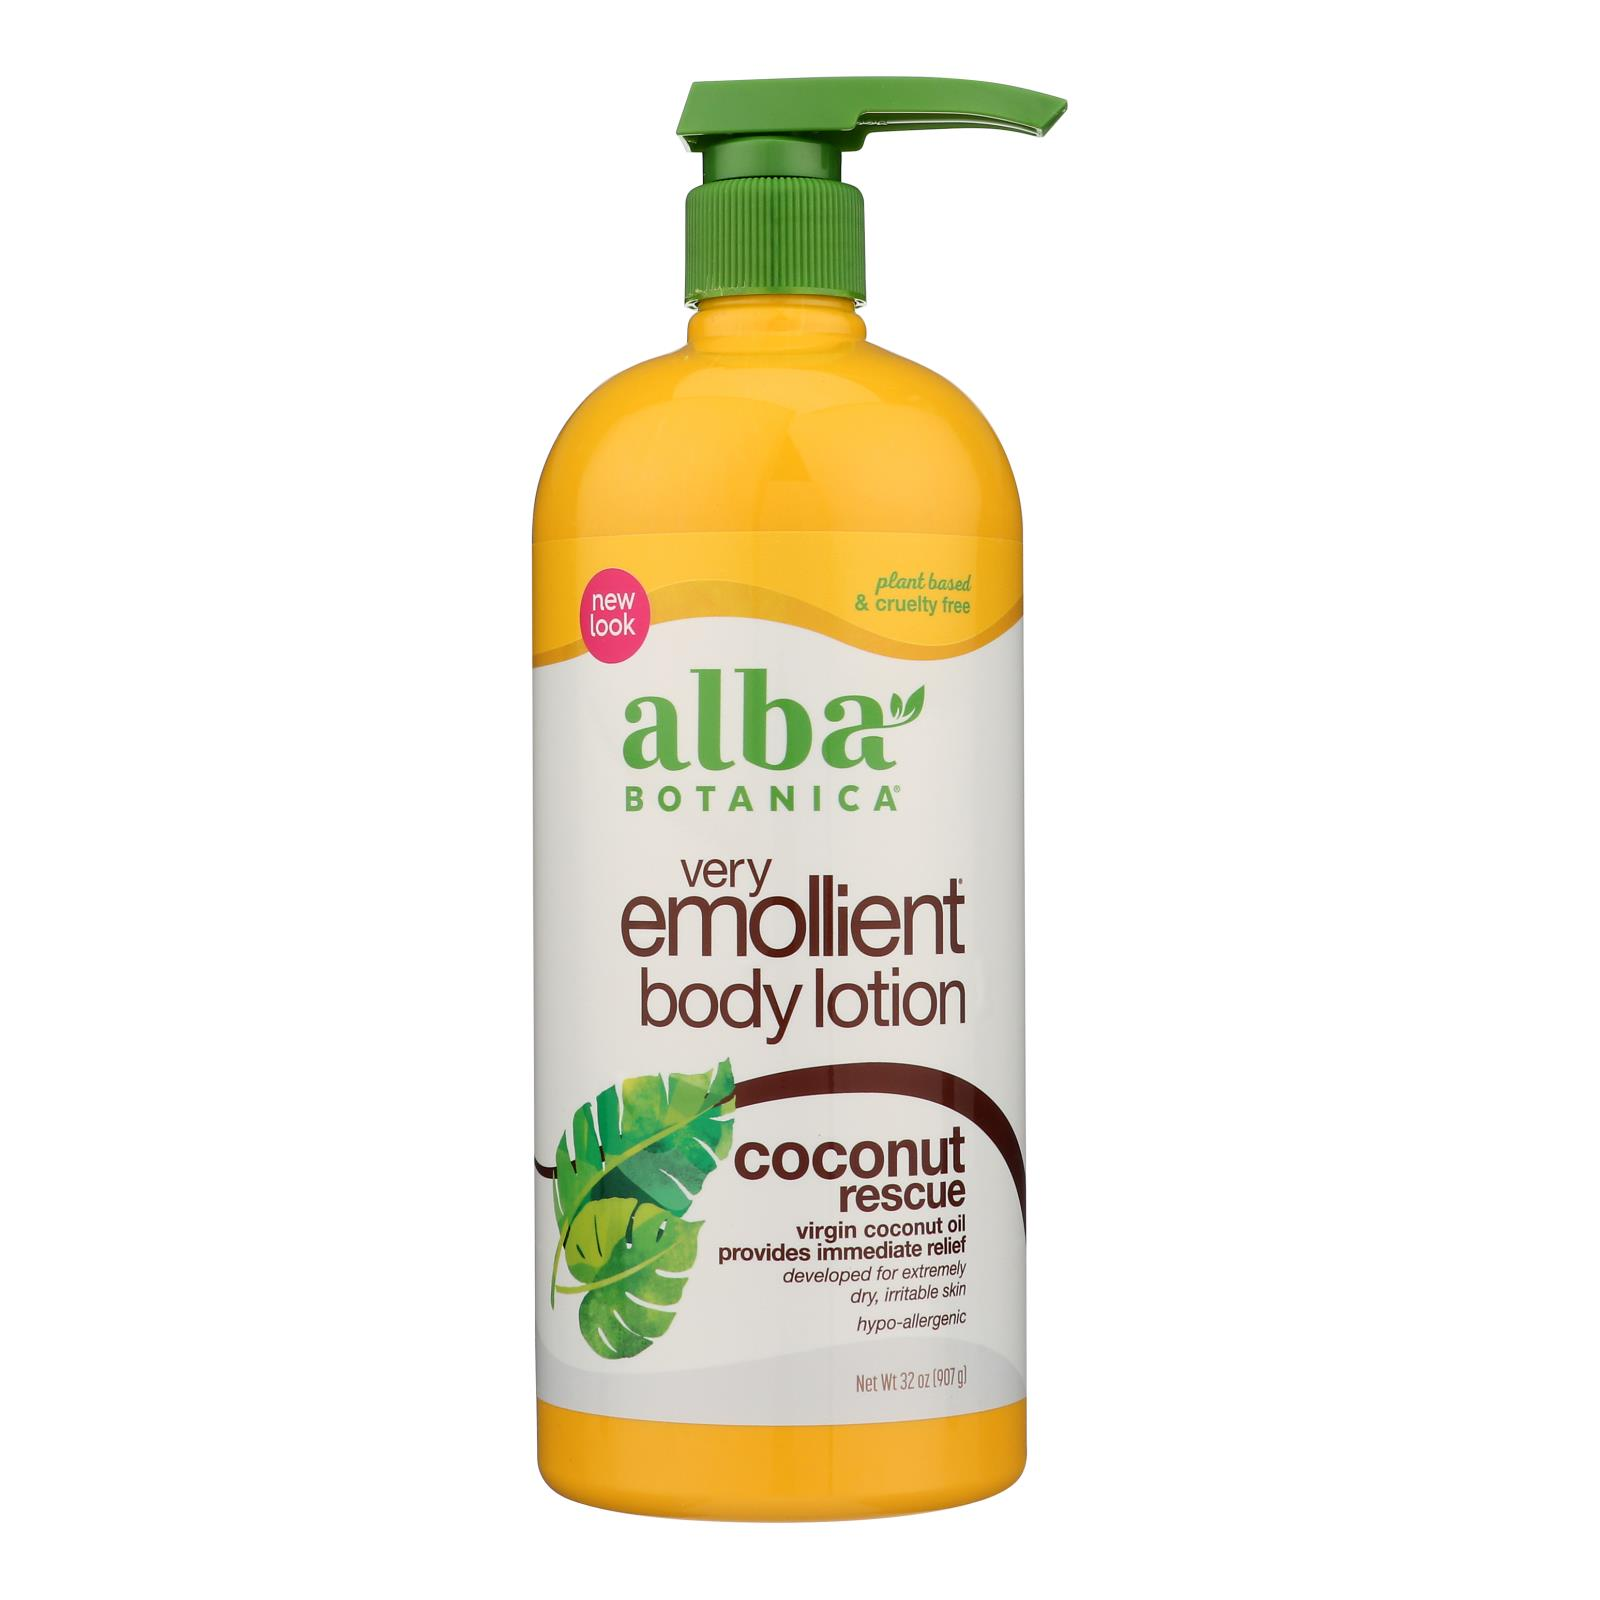 Alba Botanica - Body Lotion - Very Emollient - Coconut Rescue - 32 oz